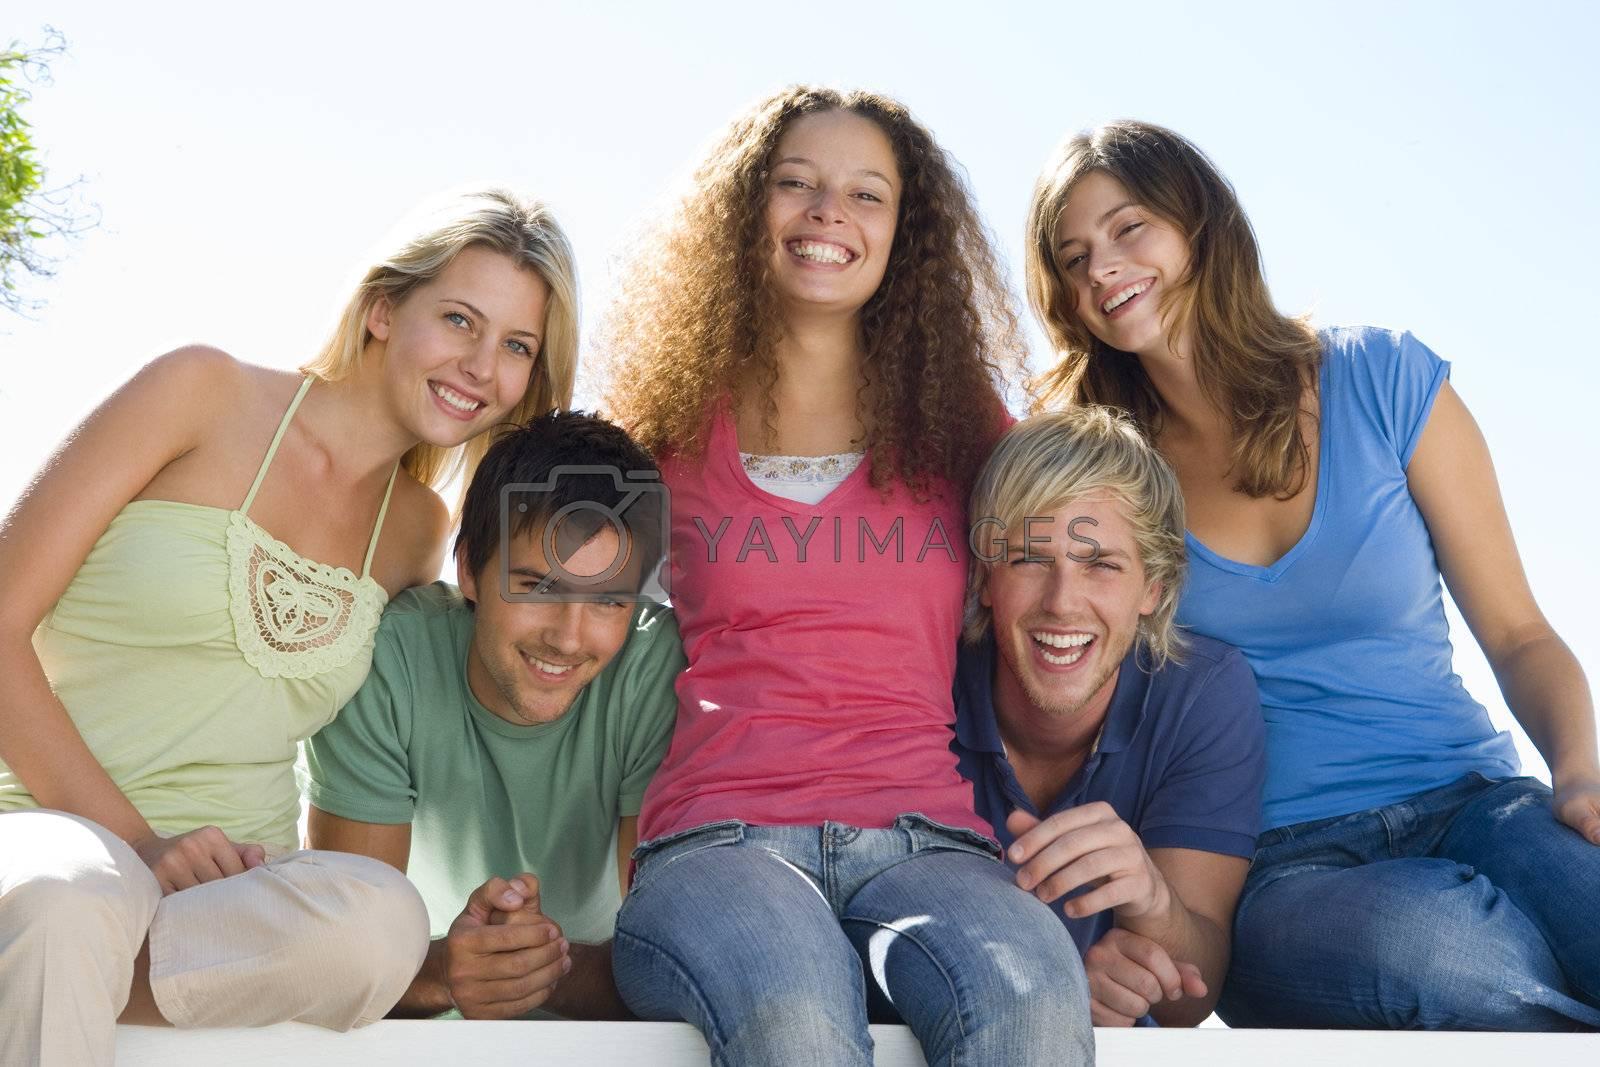 Five people on balcony smiling